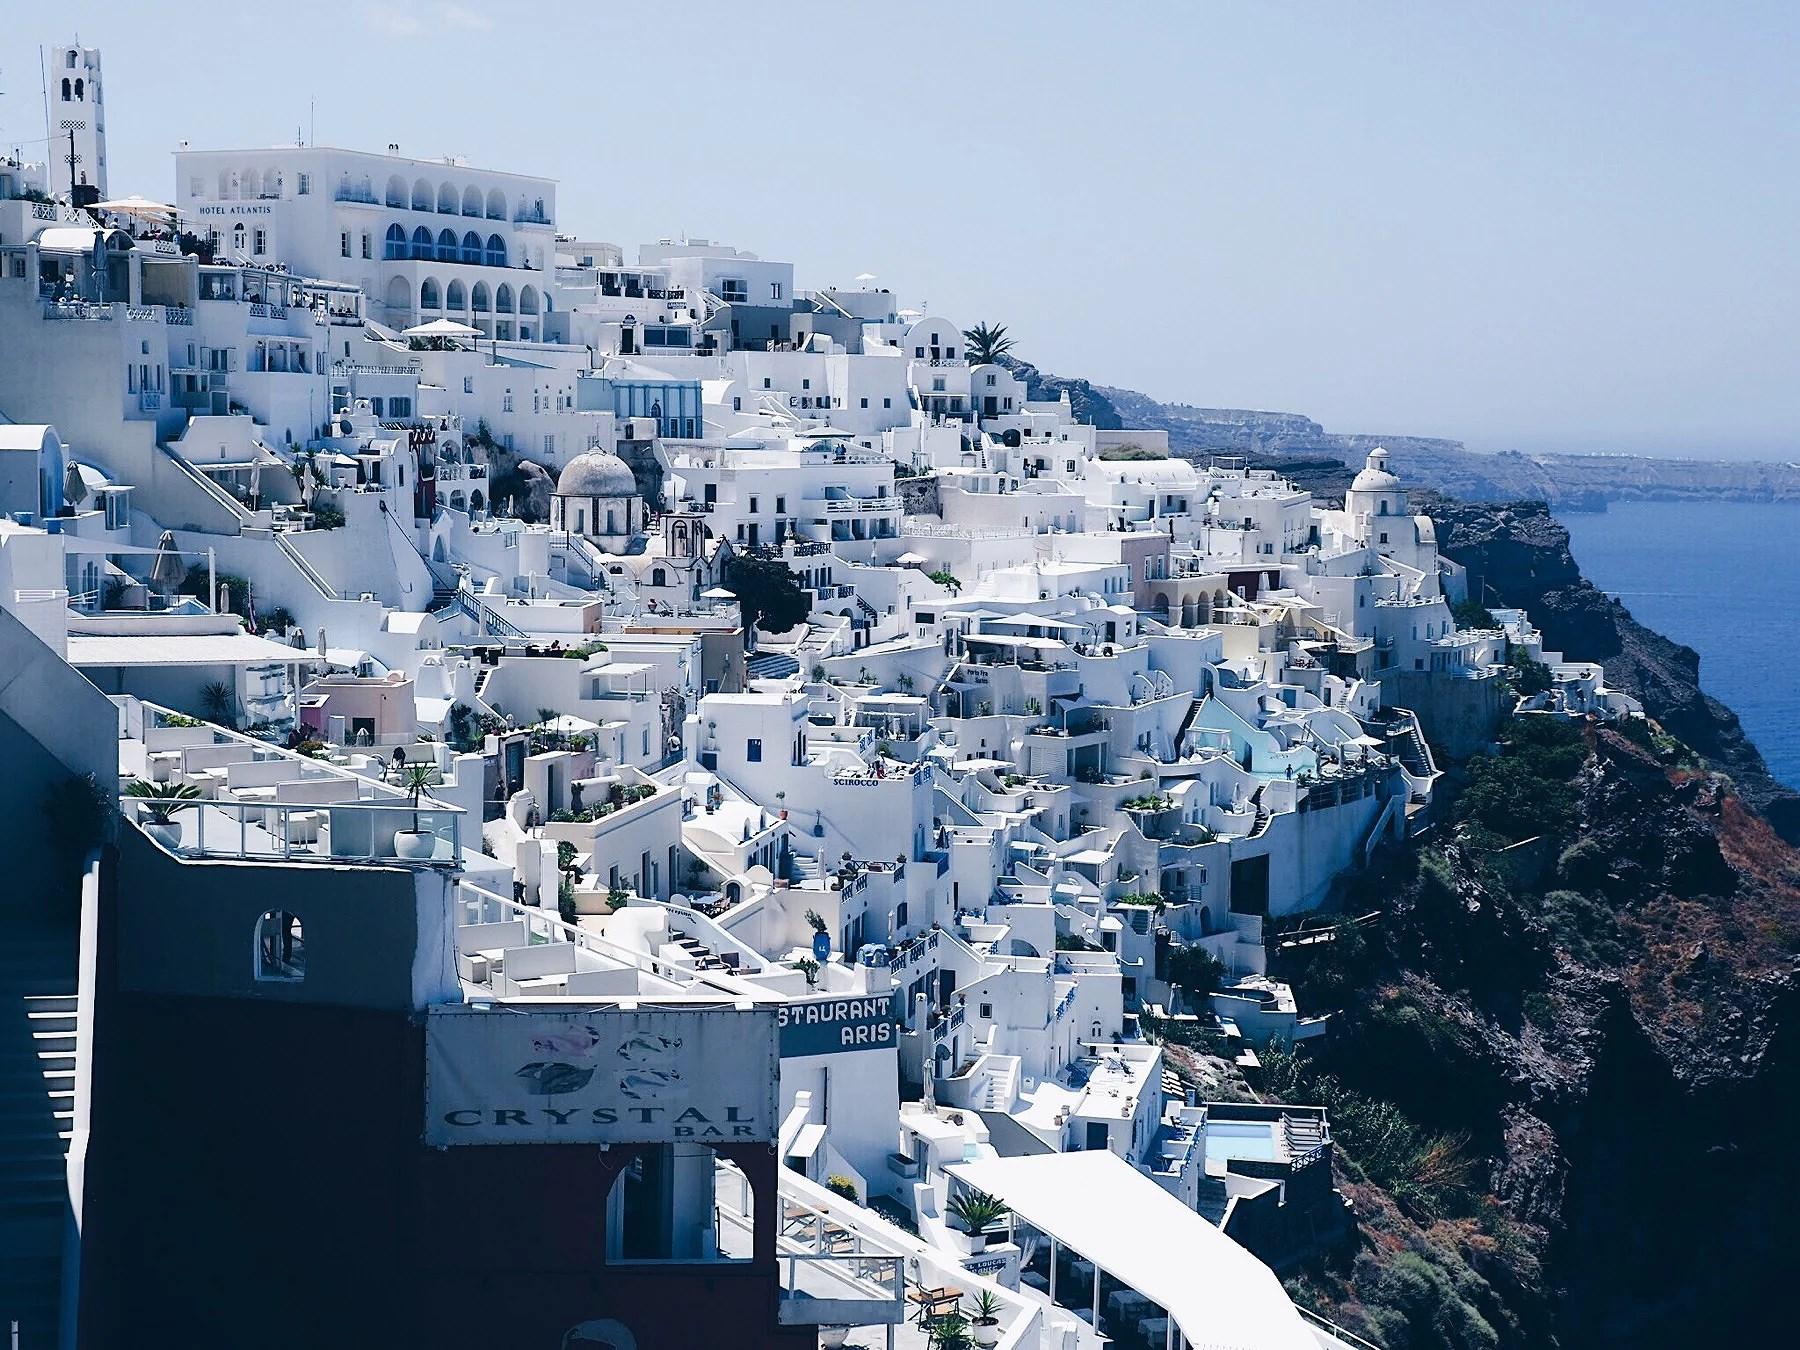 Postcard from Santorini